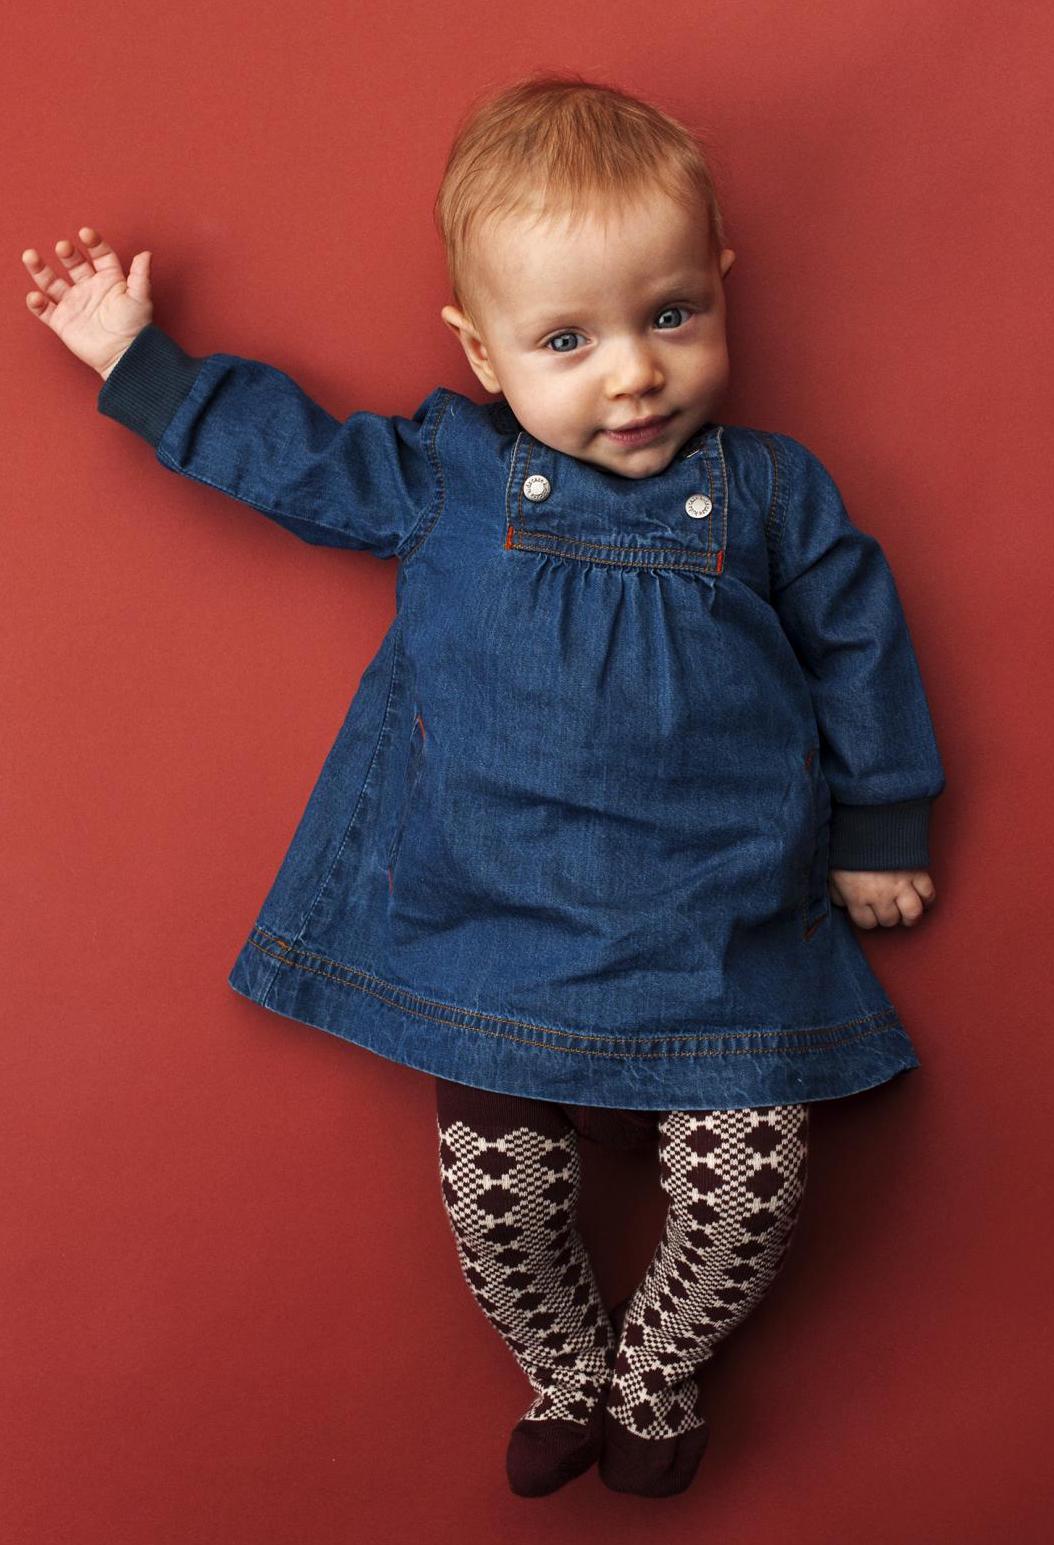 Kidscase moda bebé, Kidscase moda niños pequeños